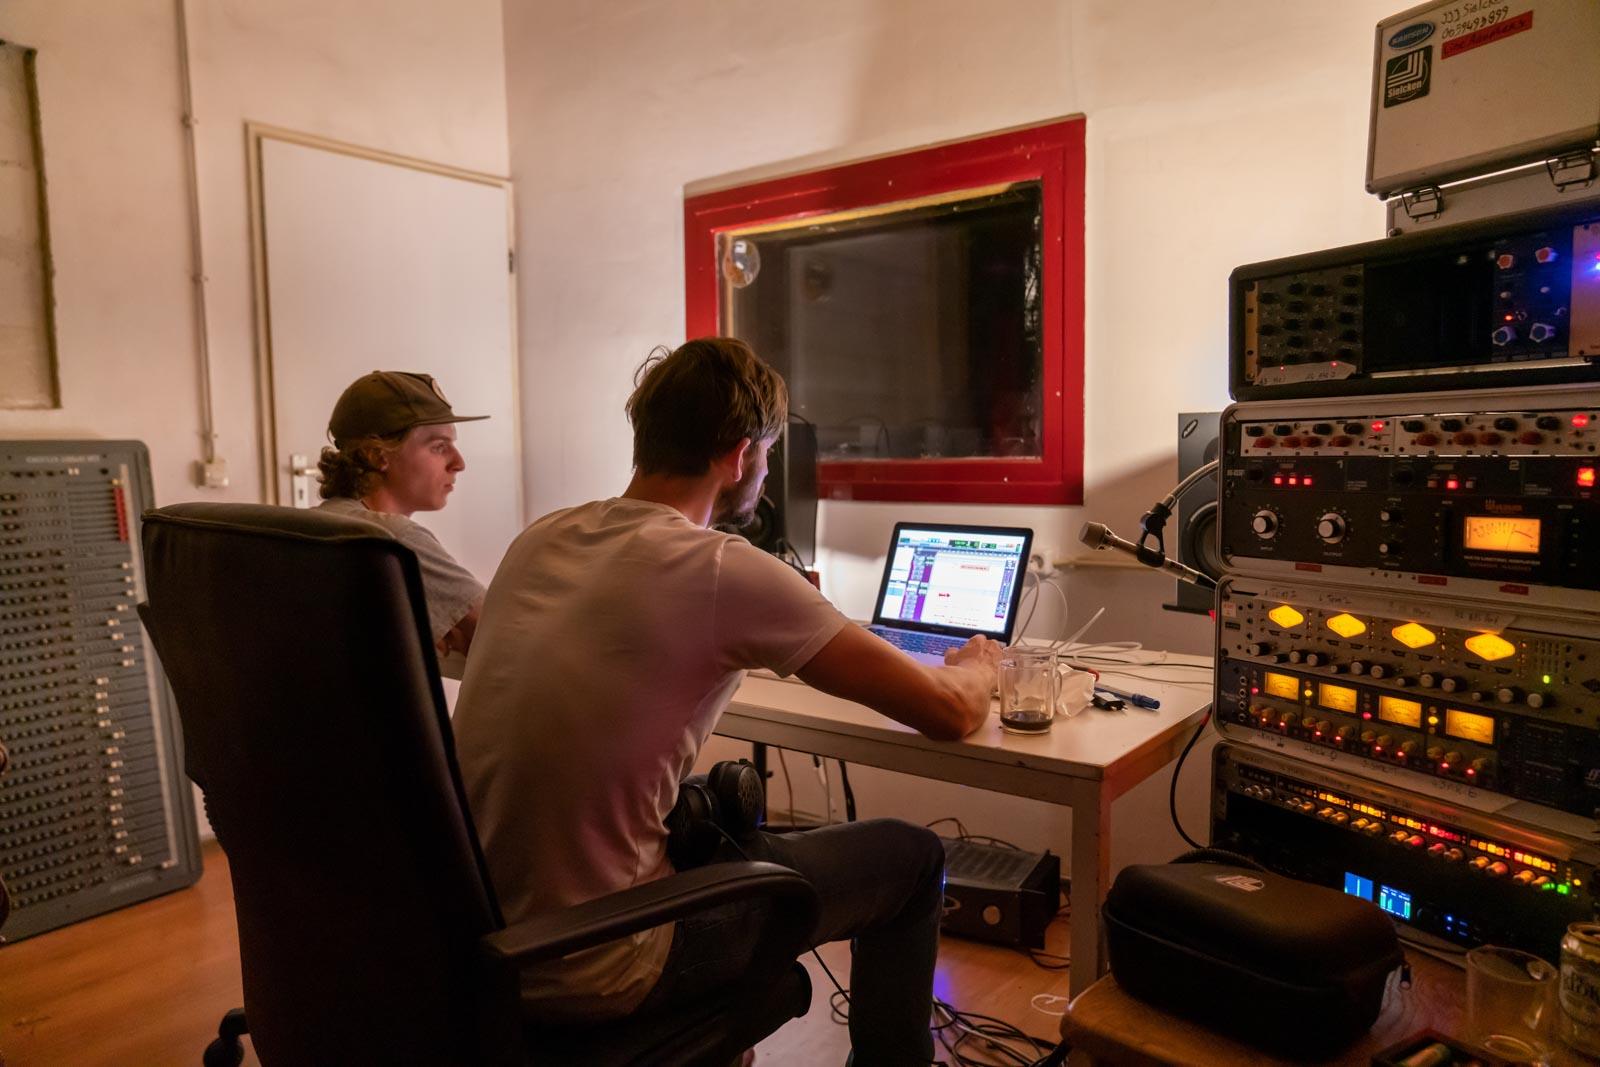 The Koalaz at Mutopia Twin Sound Studio